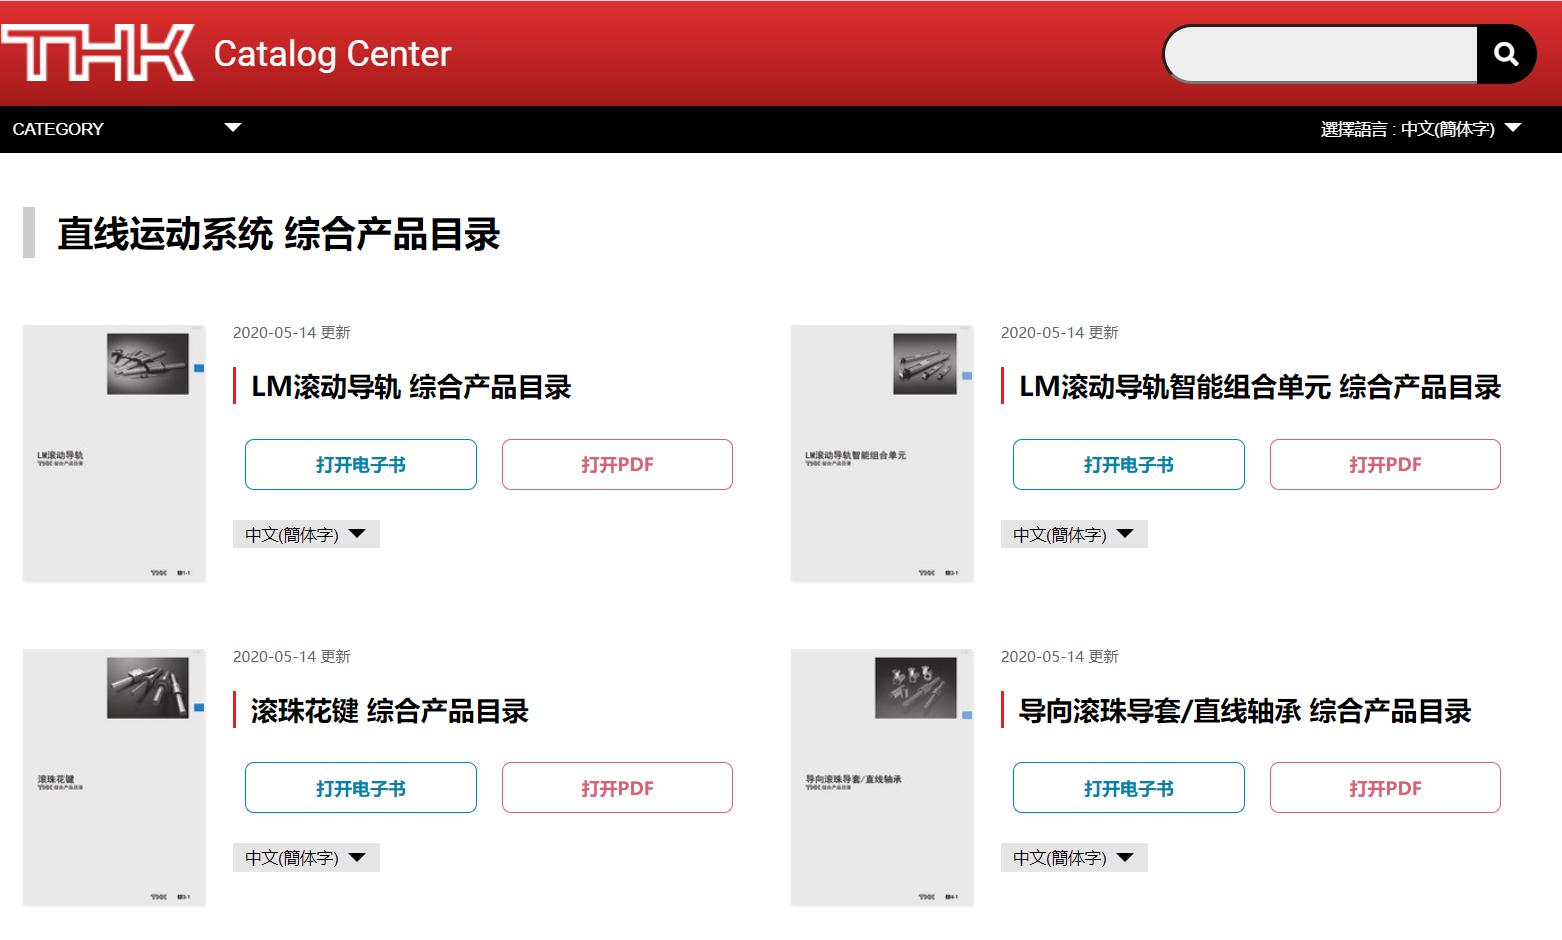 catalogcenter